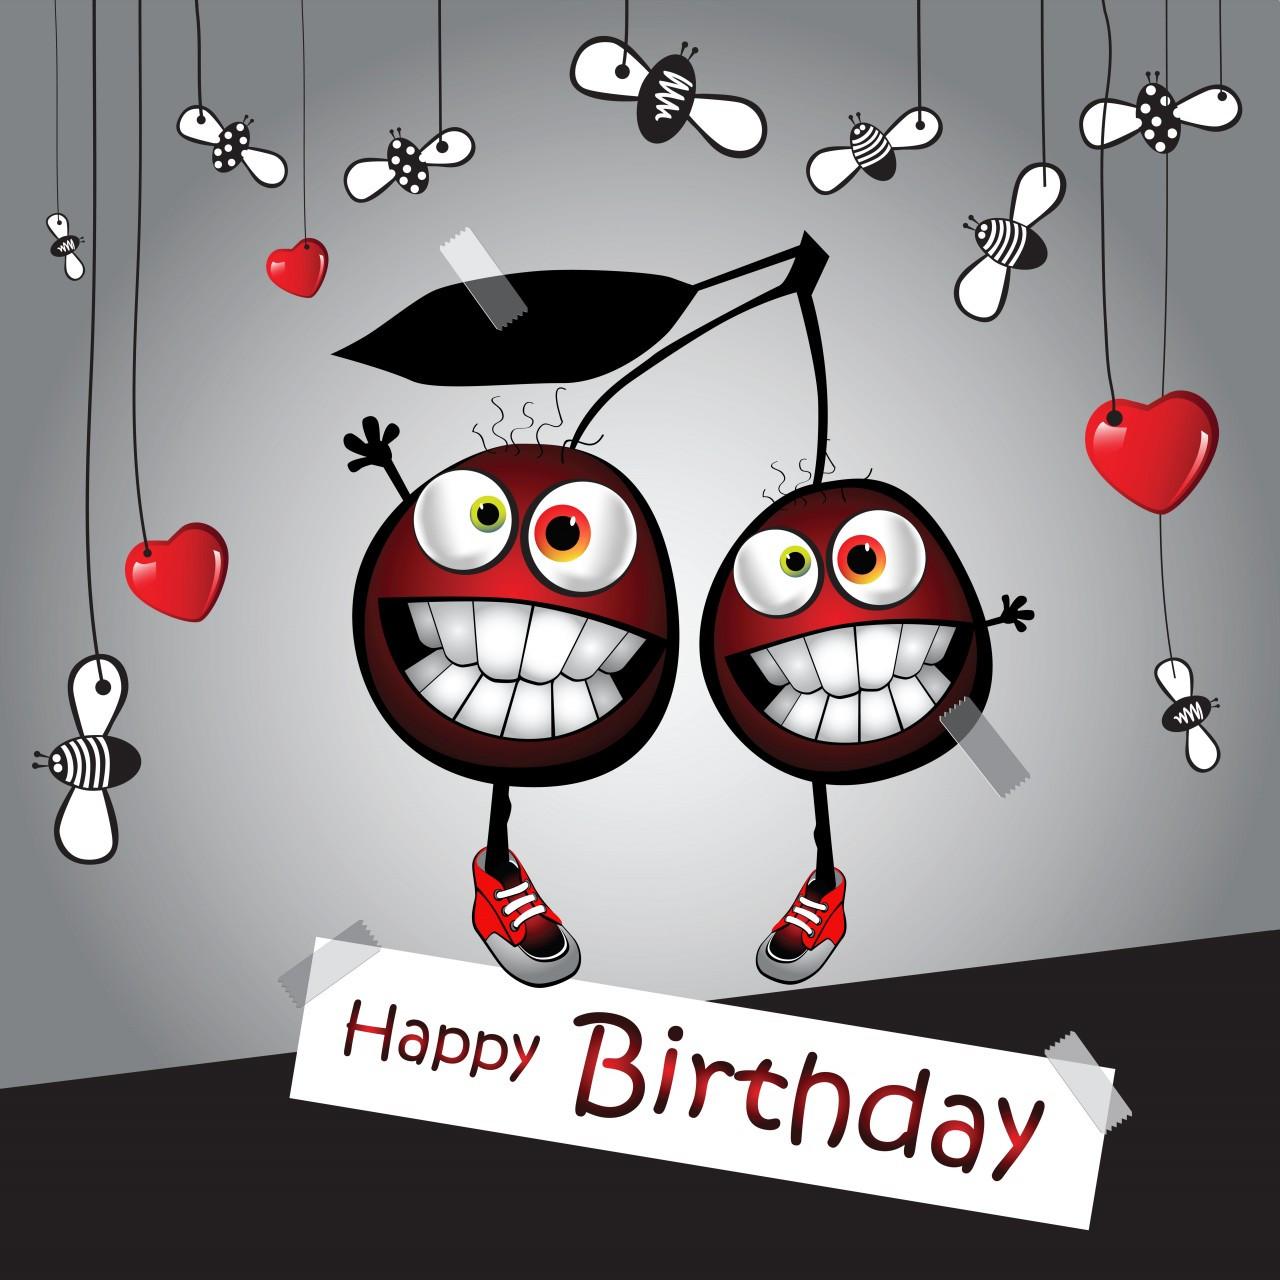 Free Happy Birthday Images Funny  happy birthday funny Free